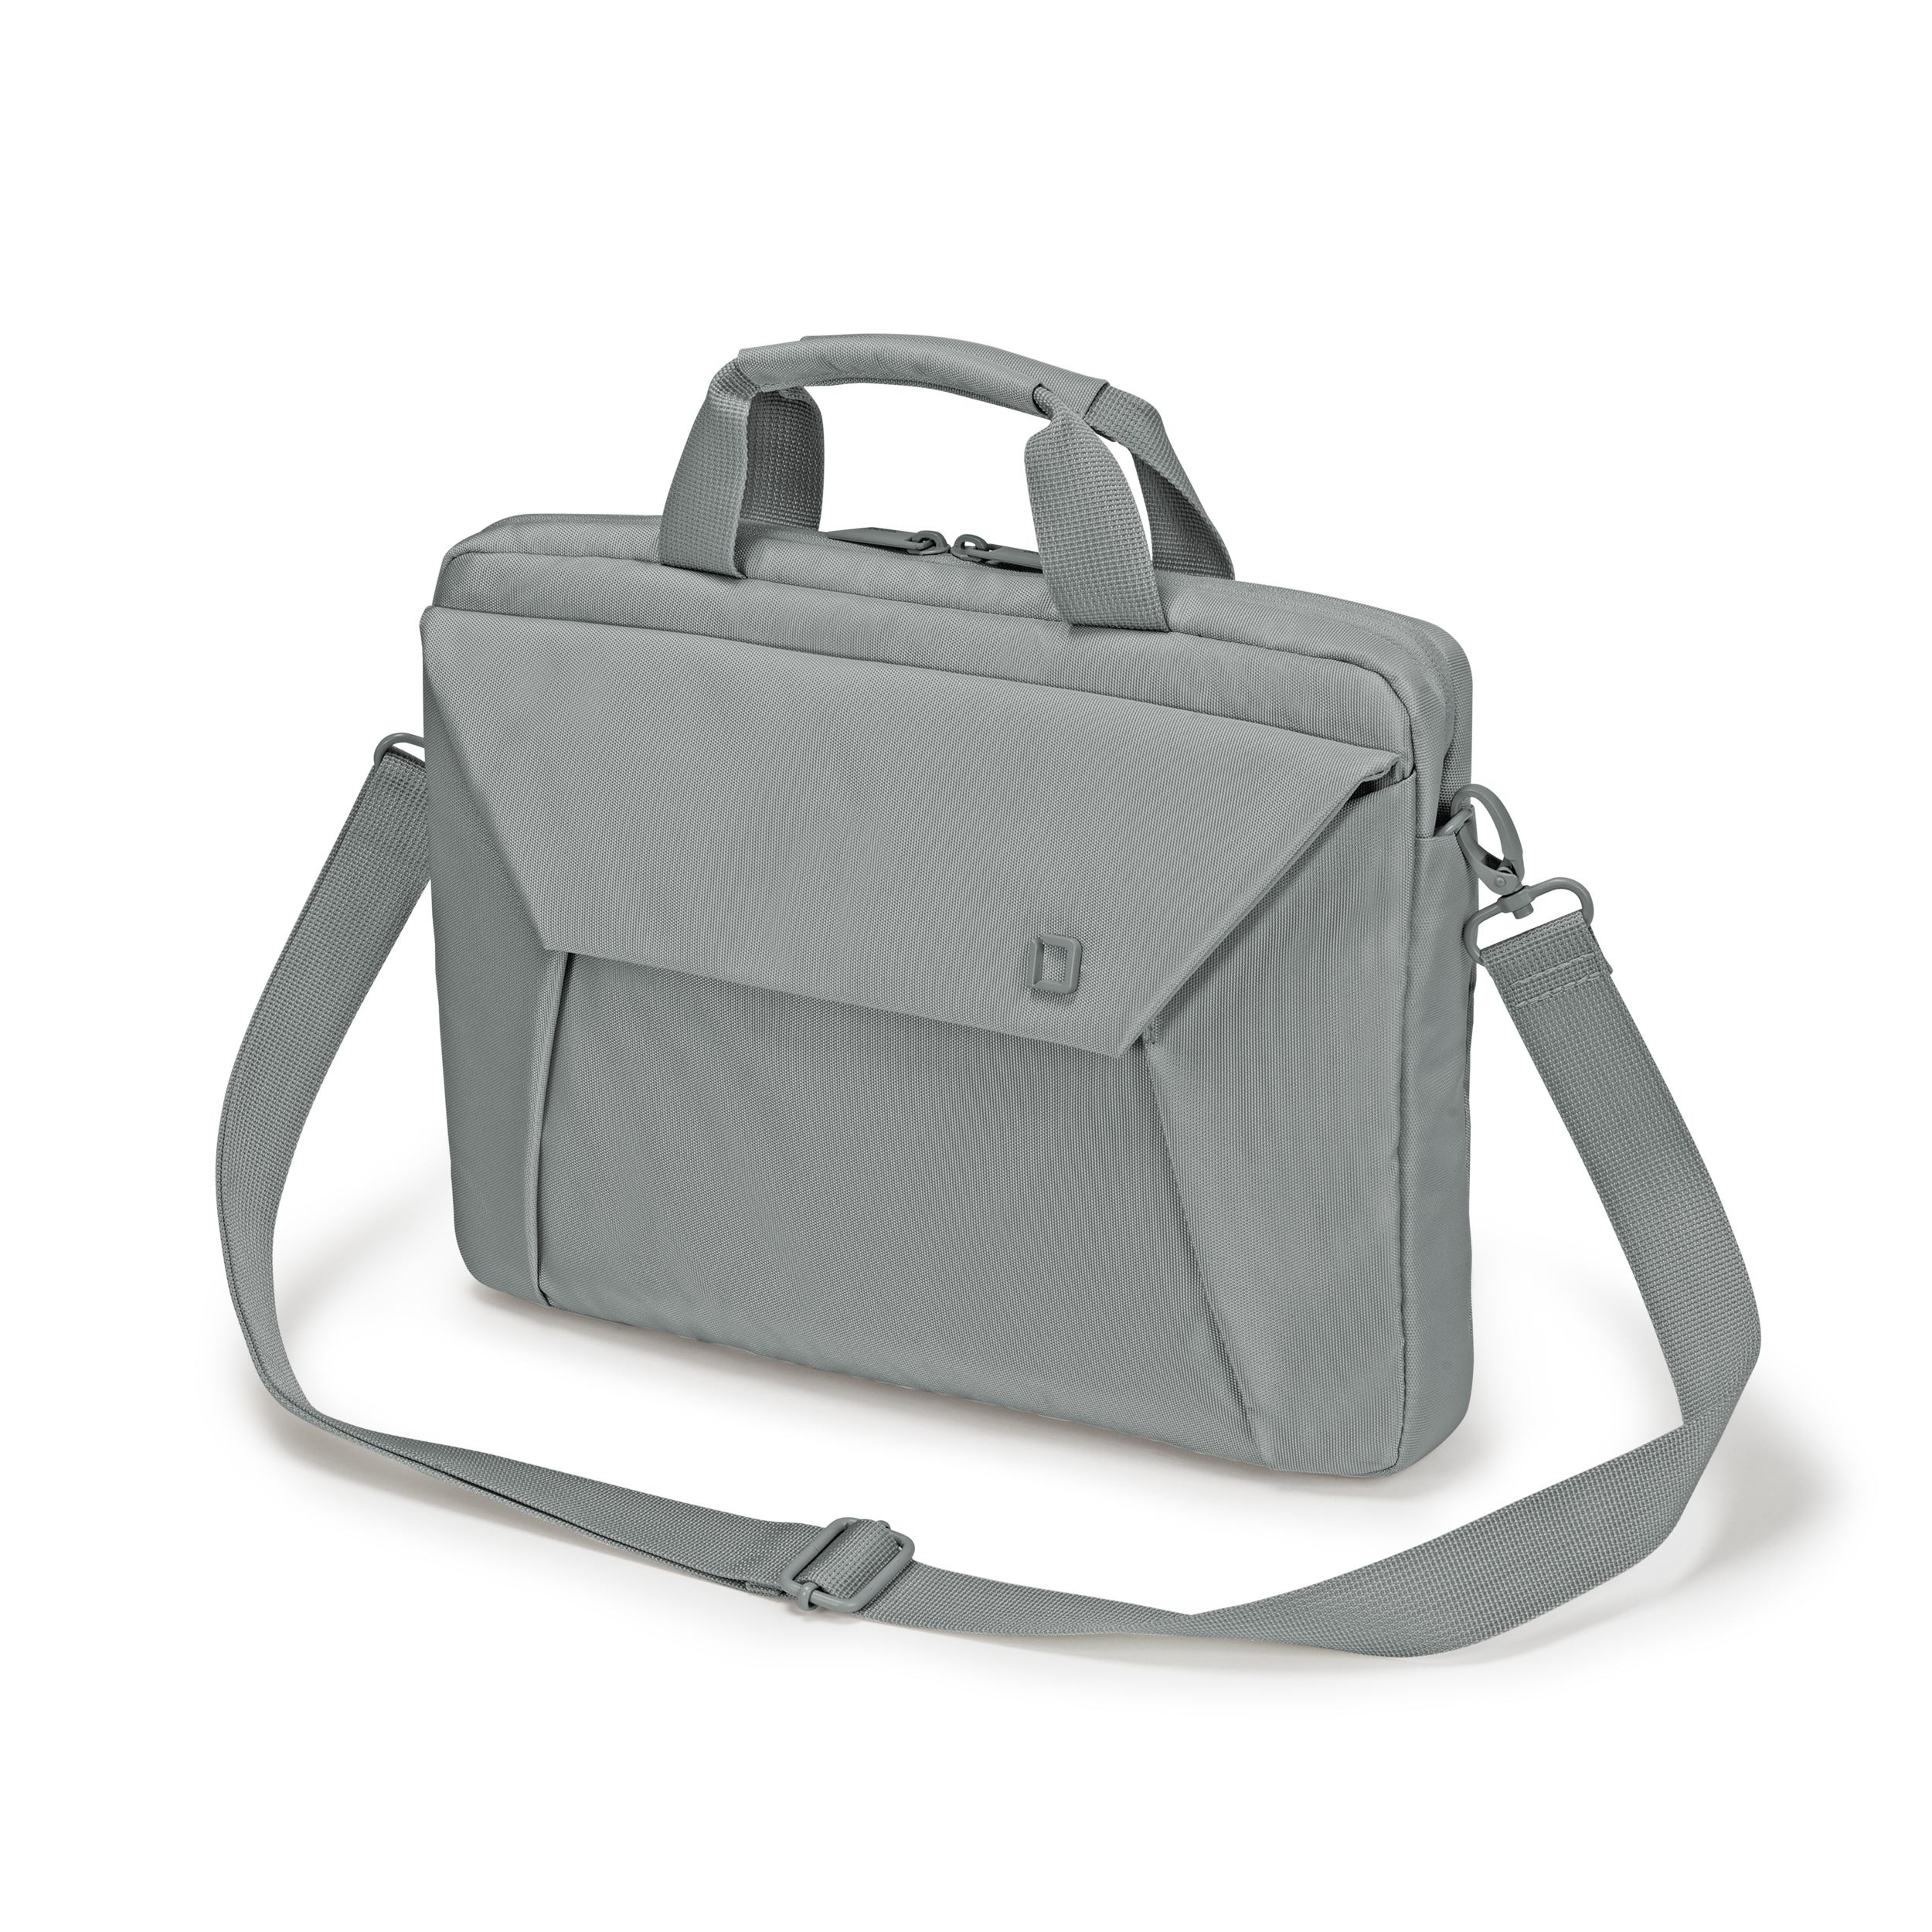 2061192-Dicota-Slim-Case-borsa-per-notebook-33-8-cm-13-3-Valigetta-ventiquattr